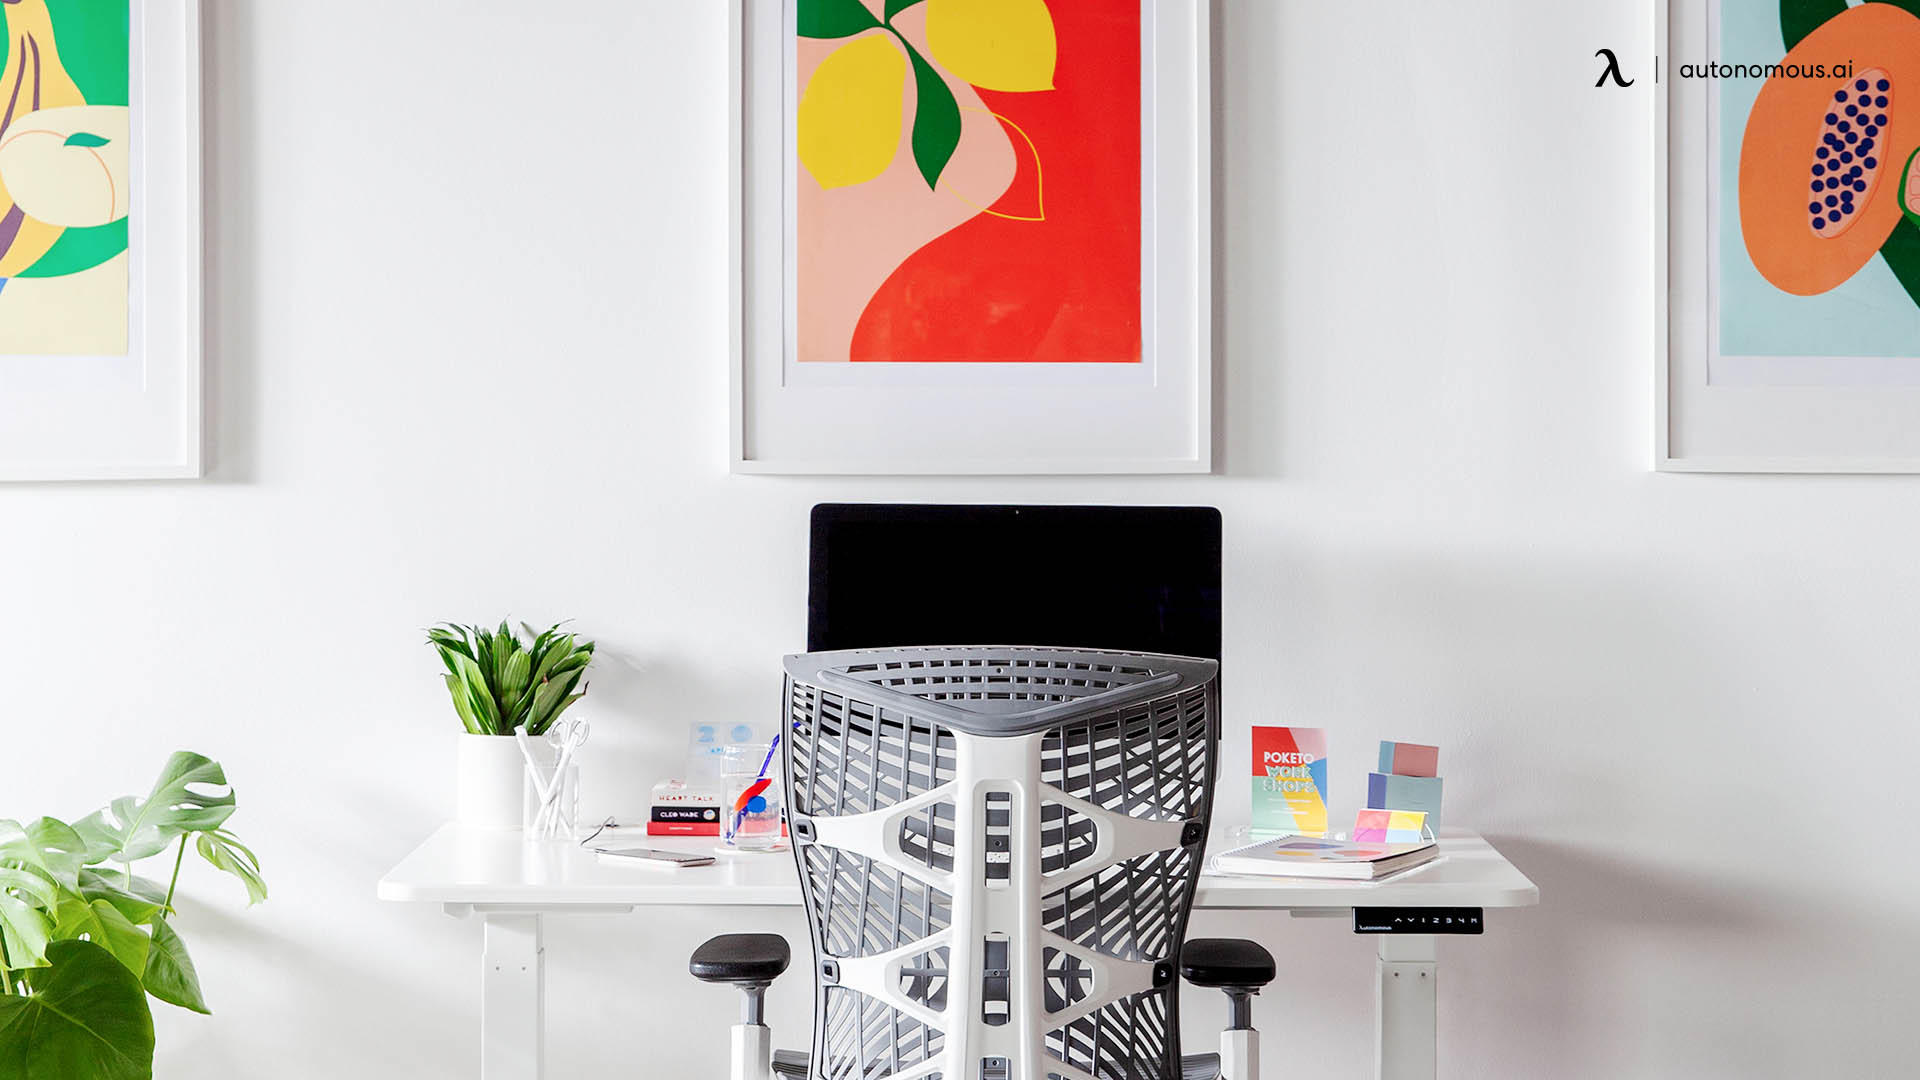 The Complete Ergonomic Home Office White Desk PC Setup